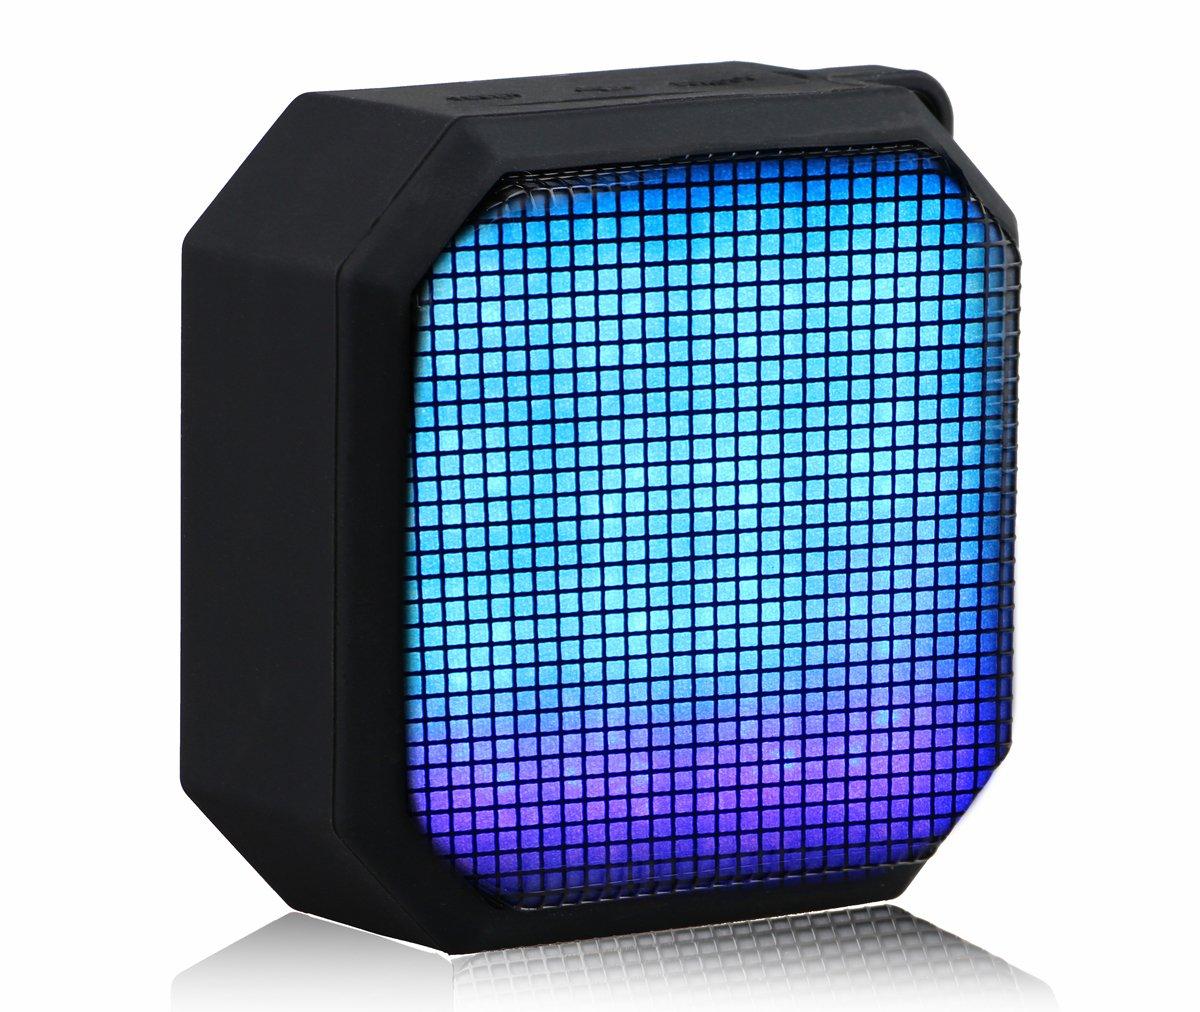 Bvnine Mini Wireless Speaker Portable Outdoor Speaker with LED for Cellphone/MP3/Laptop/iPod/TV